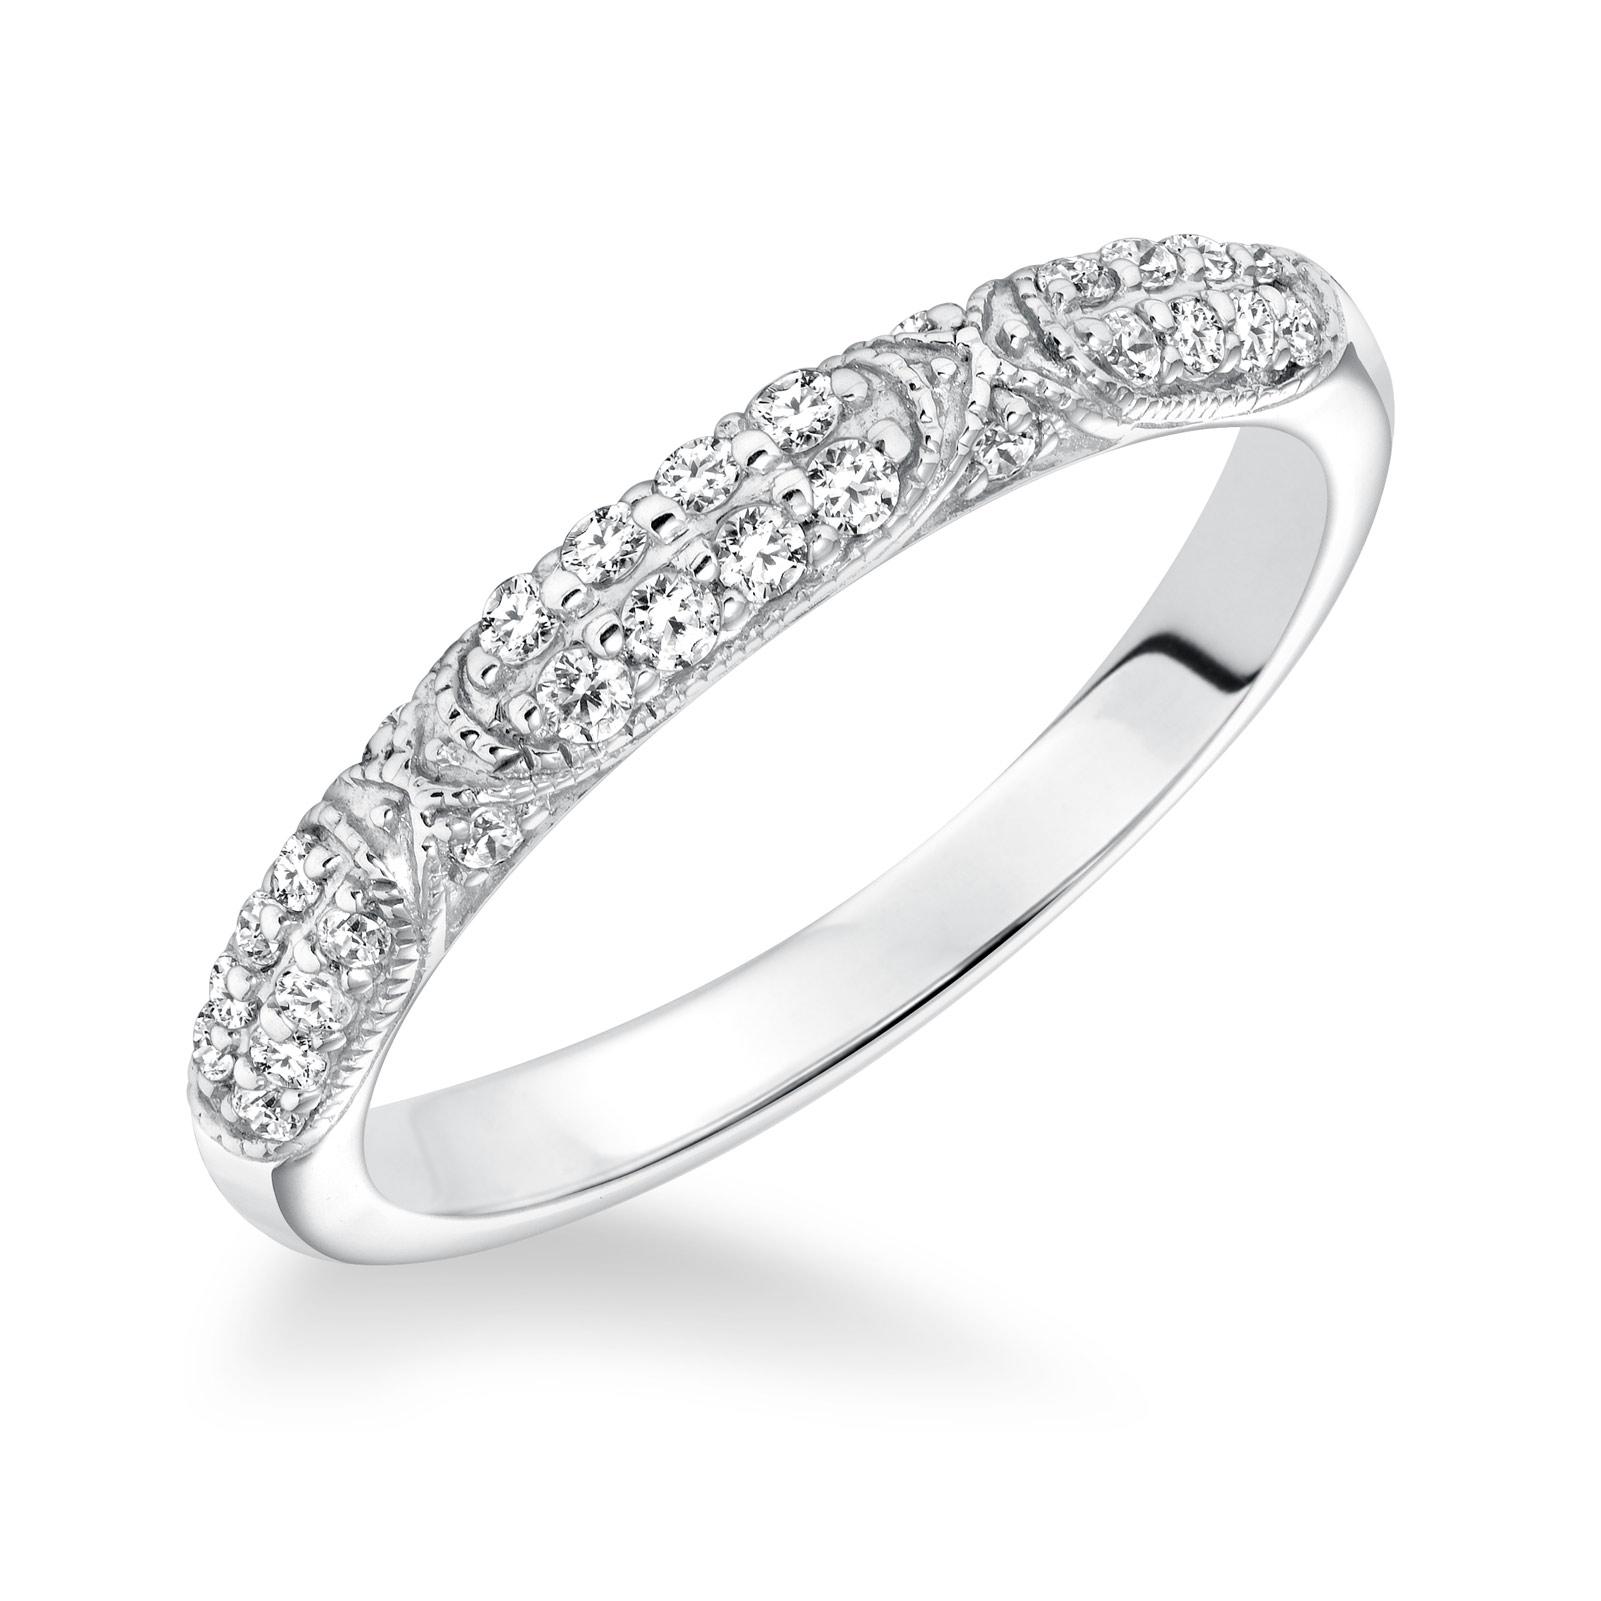 Goldman ring 31 958w l00 long island ny wedding bands for Long island wedding bands